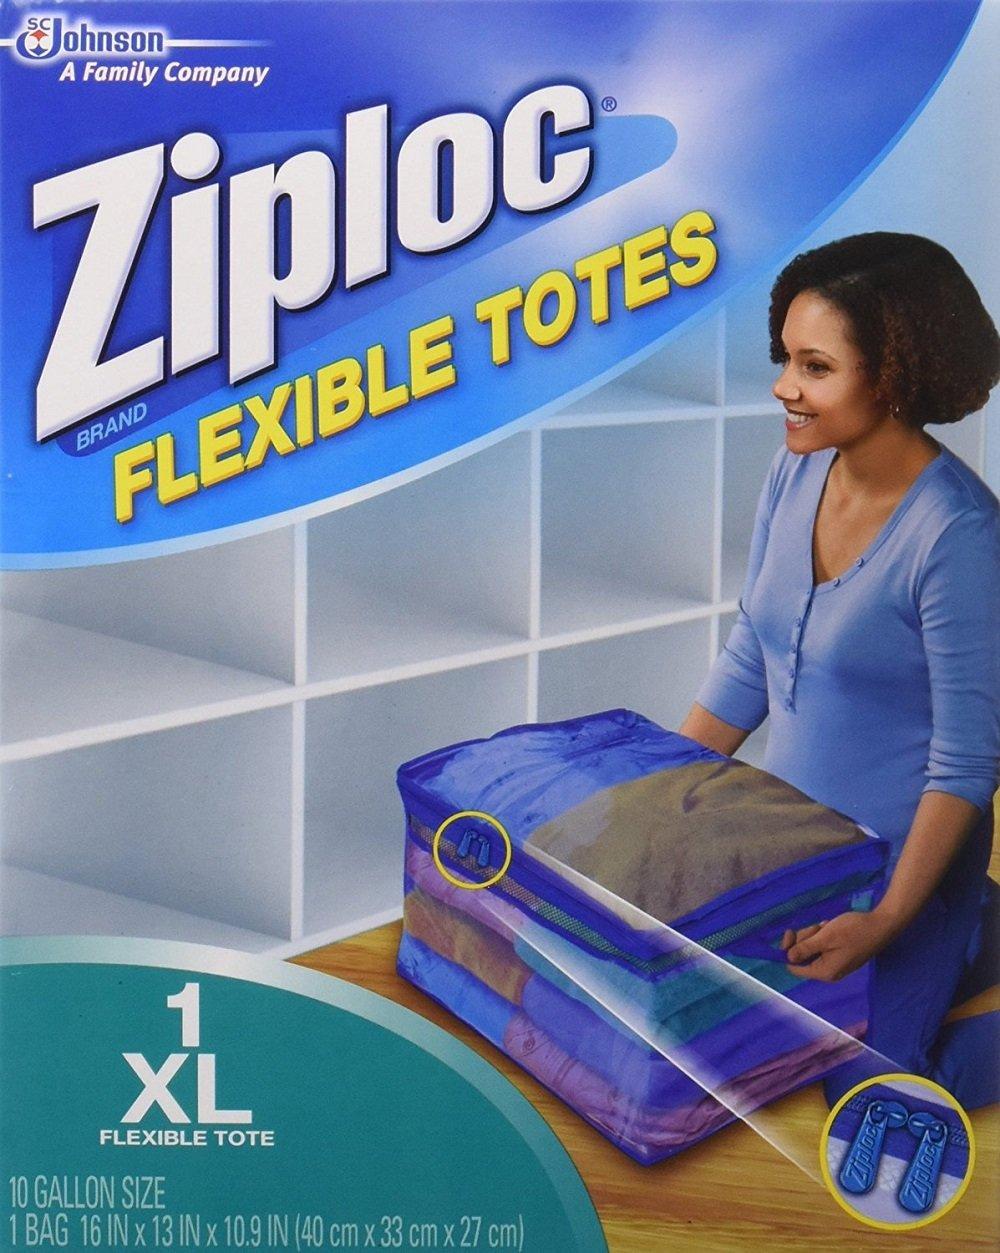 Ziploc Flexible Totes pzxdVC, X-Large 9 Pack